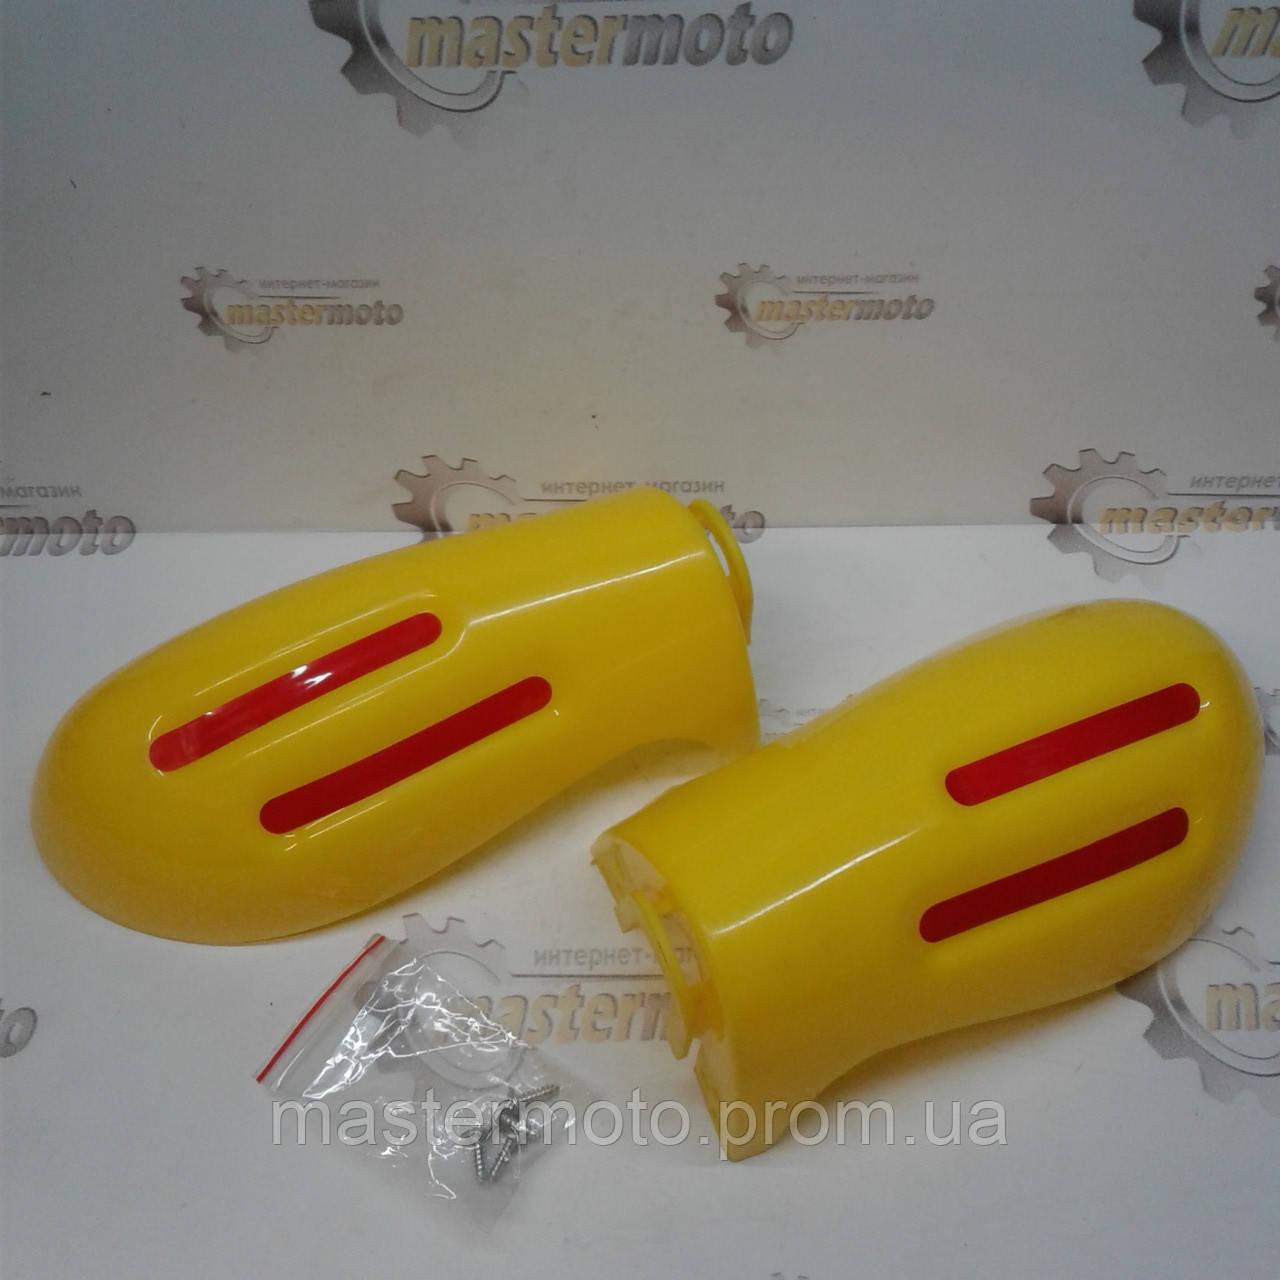 Защита рук на руль, желтые,  XJB